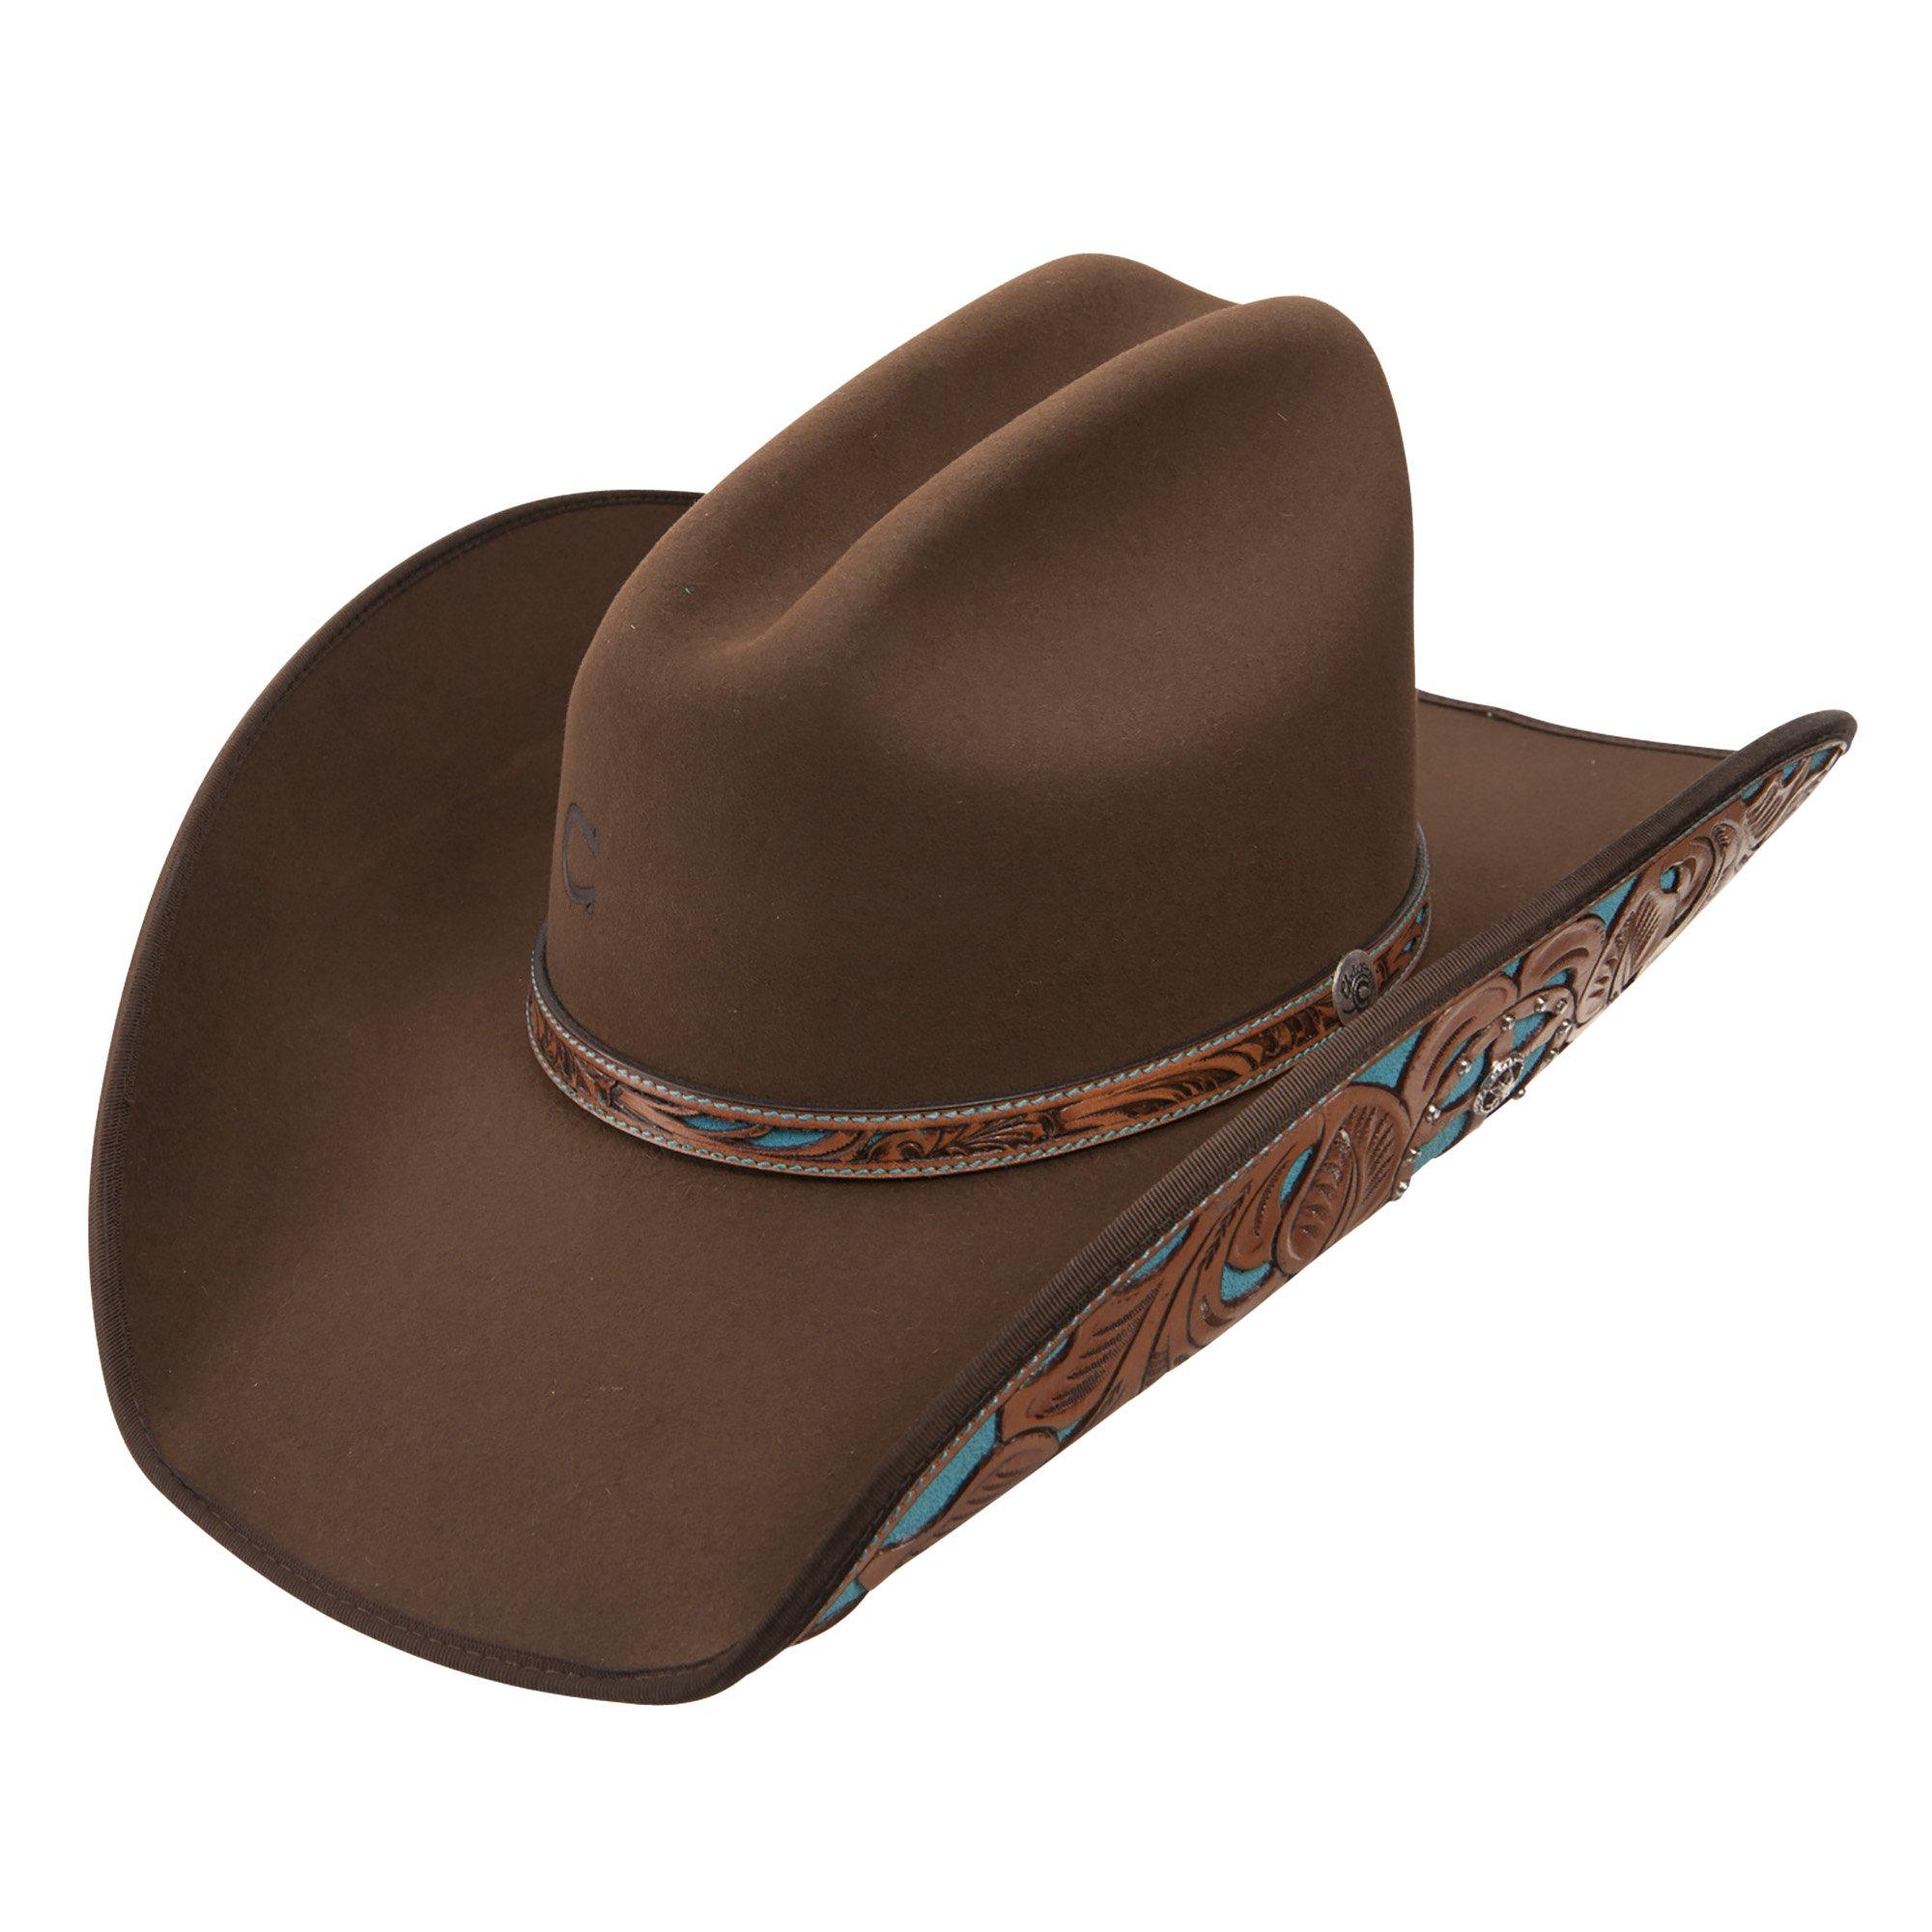 Charlie 1 Horse Cheyenne Cowboy Hat (7 1/8)